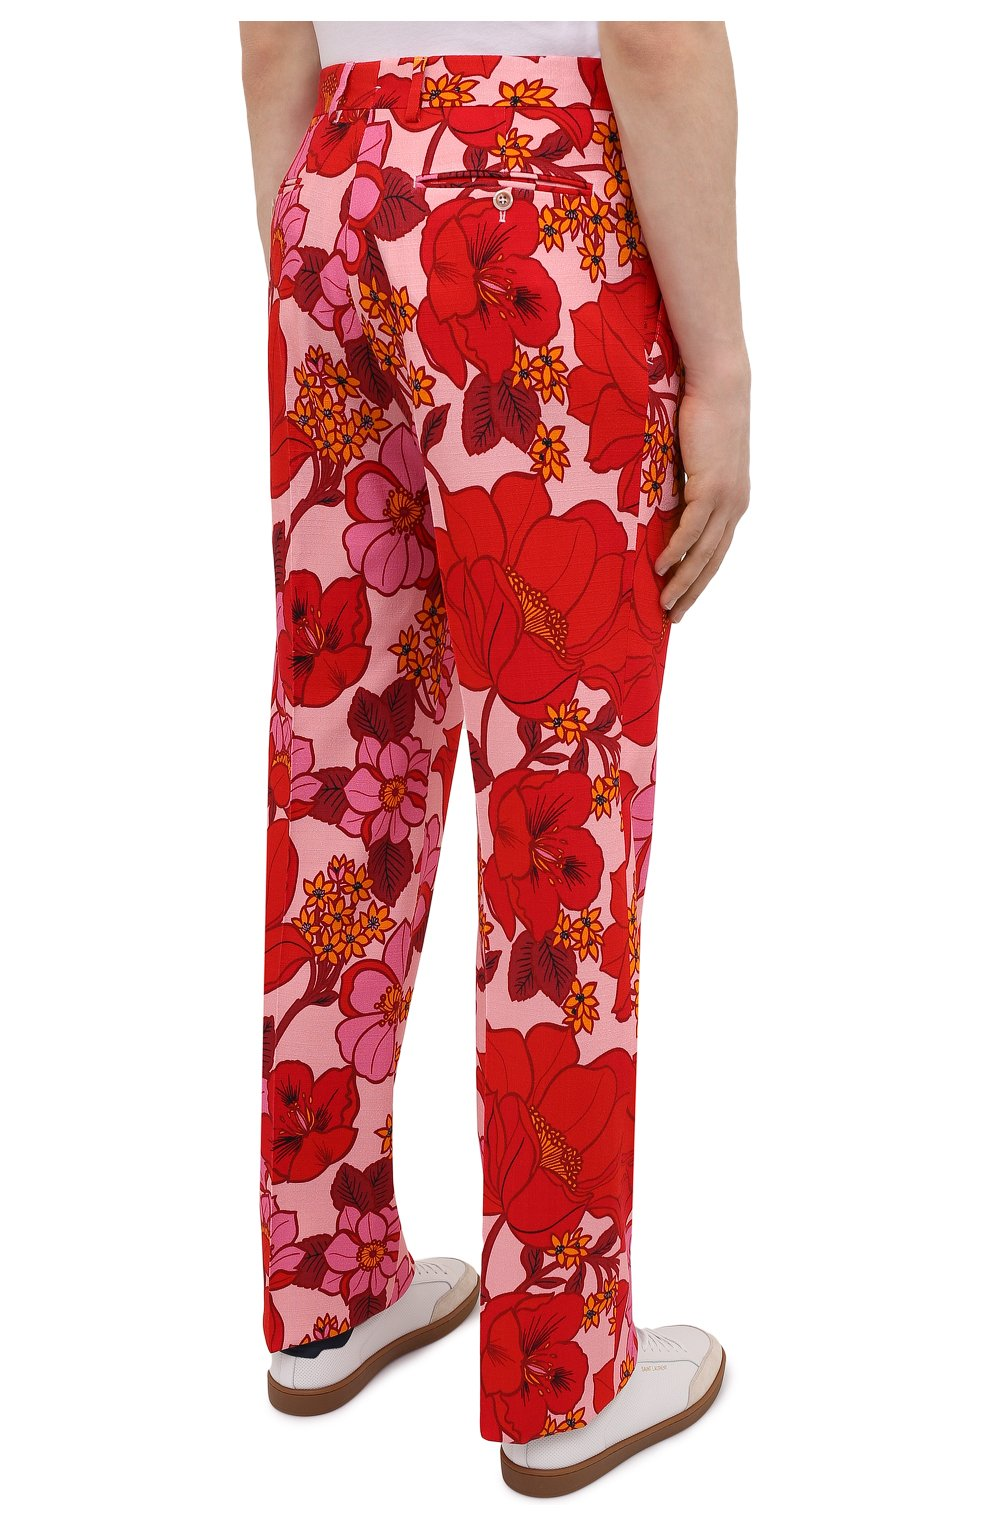 Мужские брюки из вискозы TOM FORD красного цвета, арт. 942R55/759F42 | Фото 4